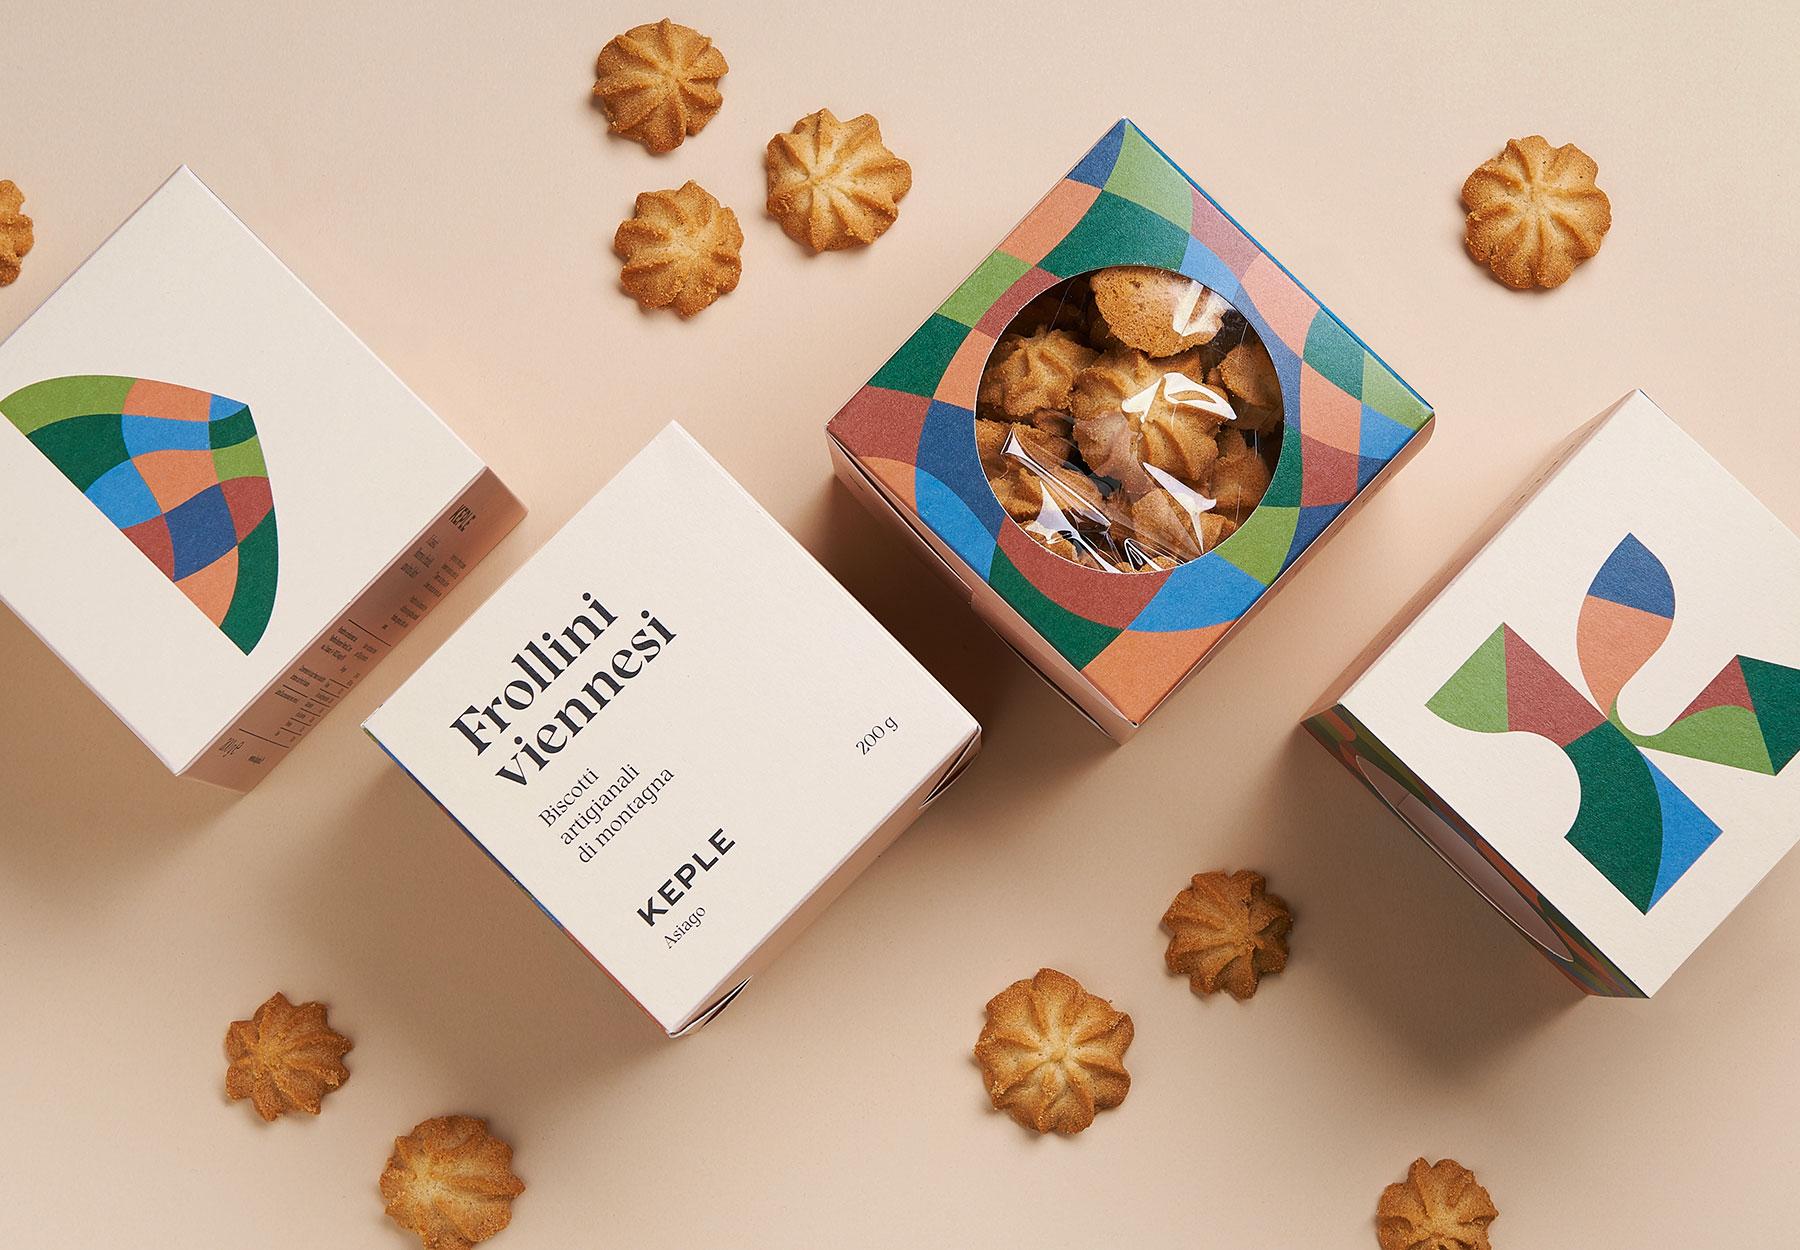 Progettazione packaging biscotti Keple Drystudio